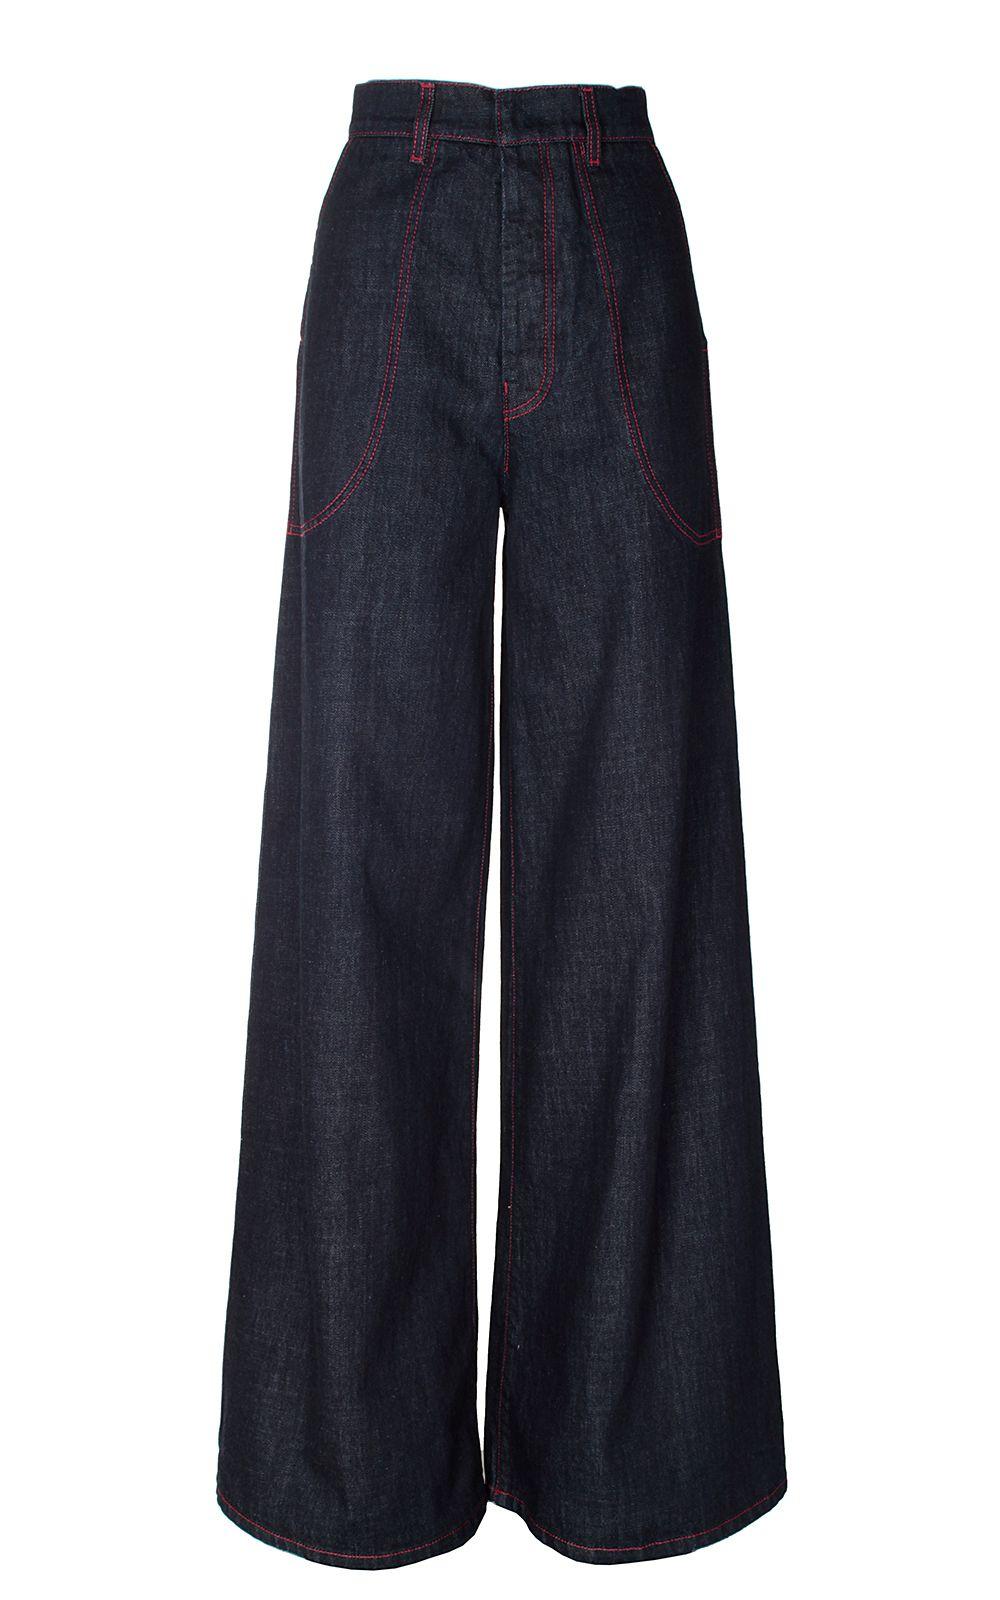 Marni High-rise Wide-leg Jeans 6527088